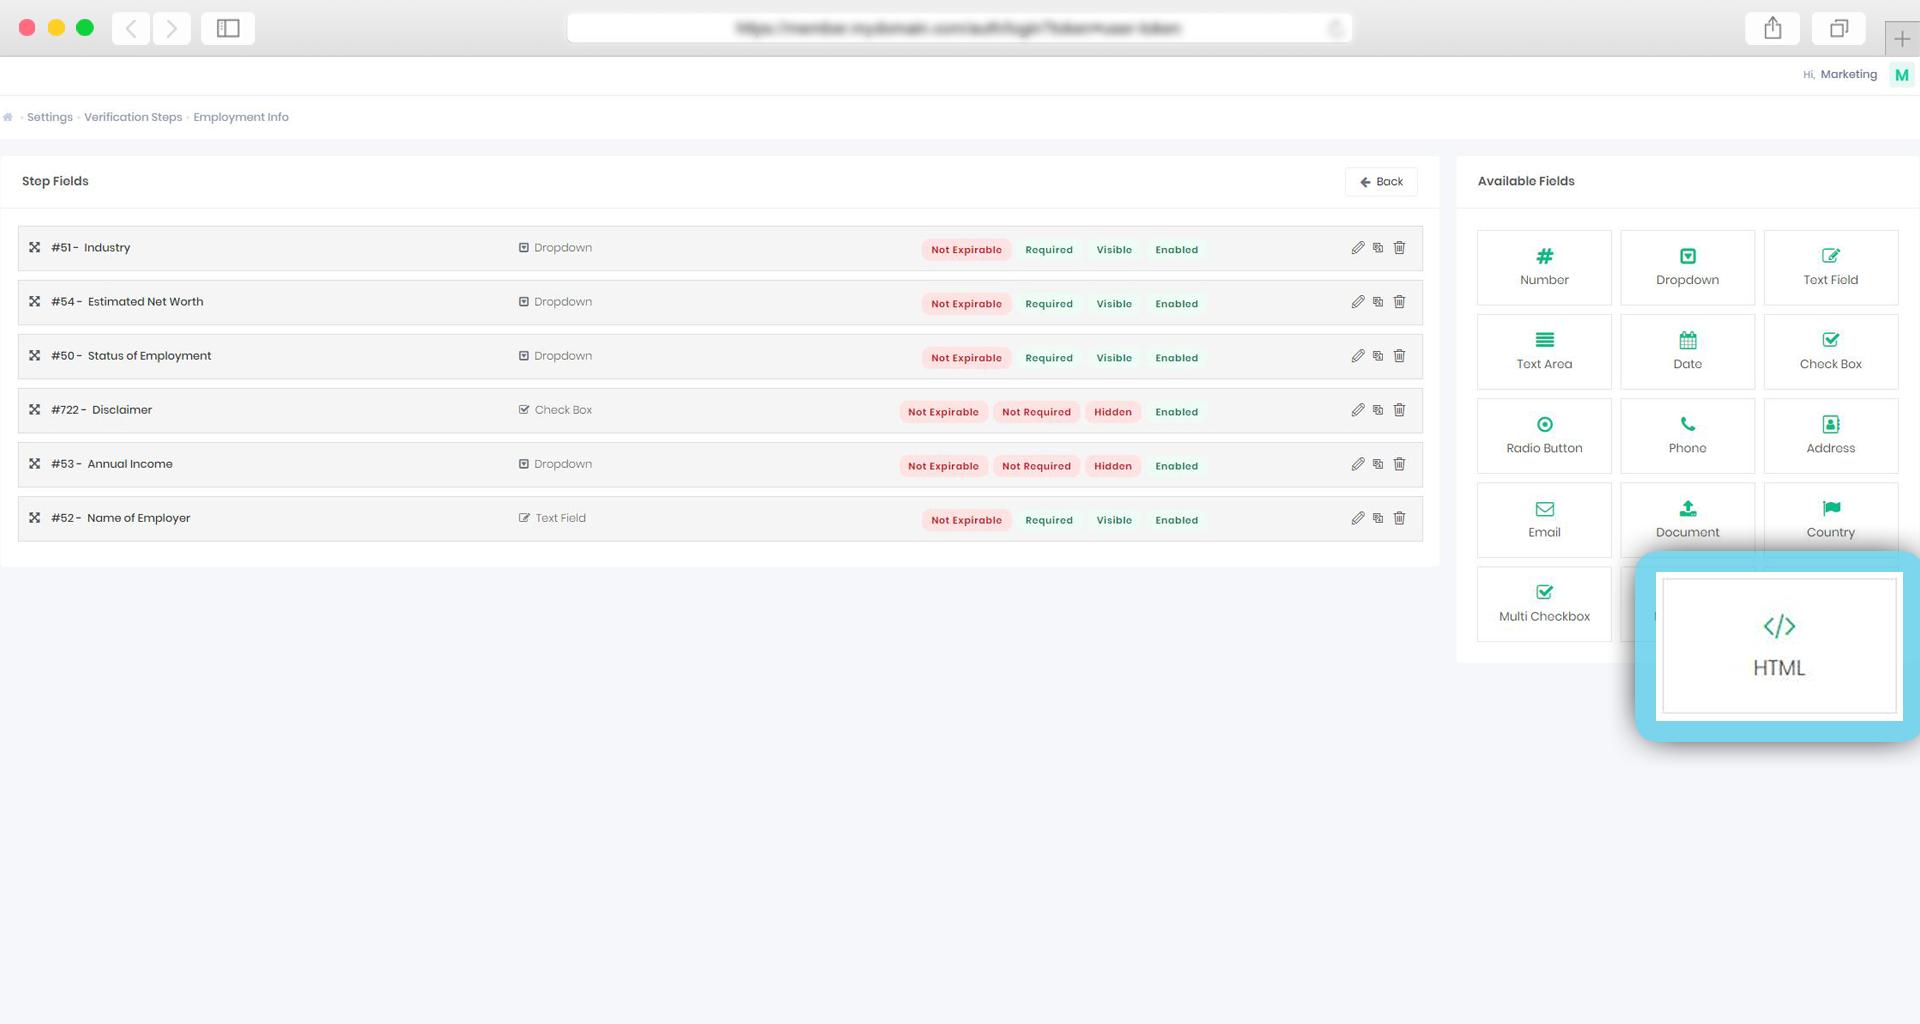 We added Custom HTML type on verification steps 3